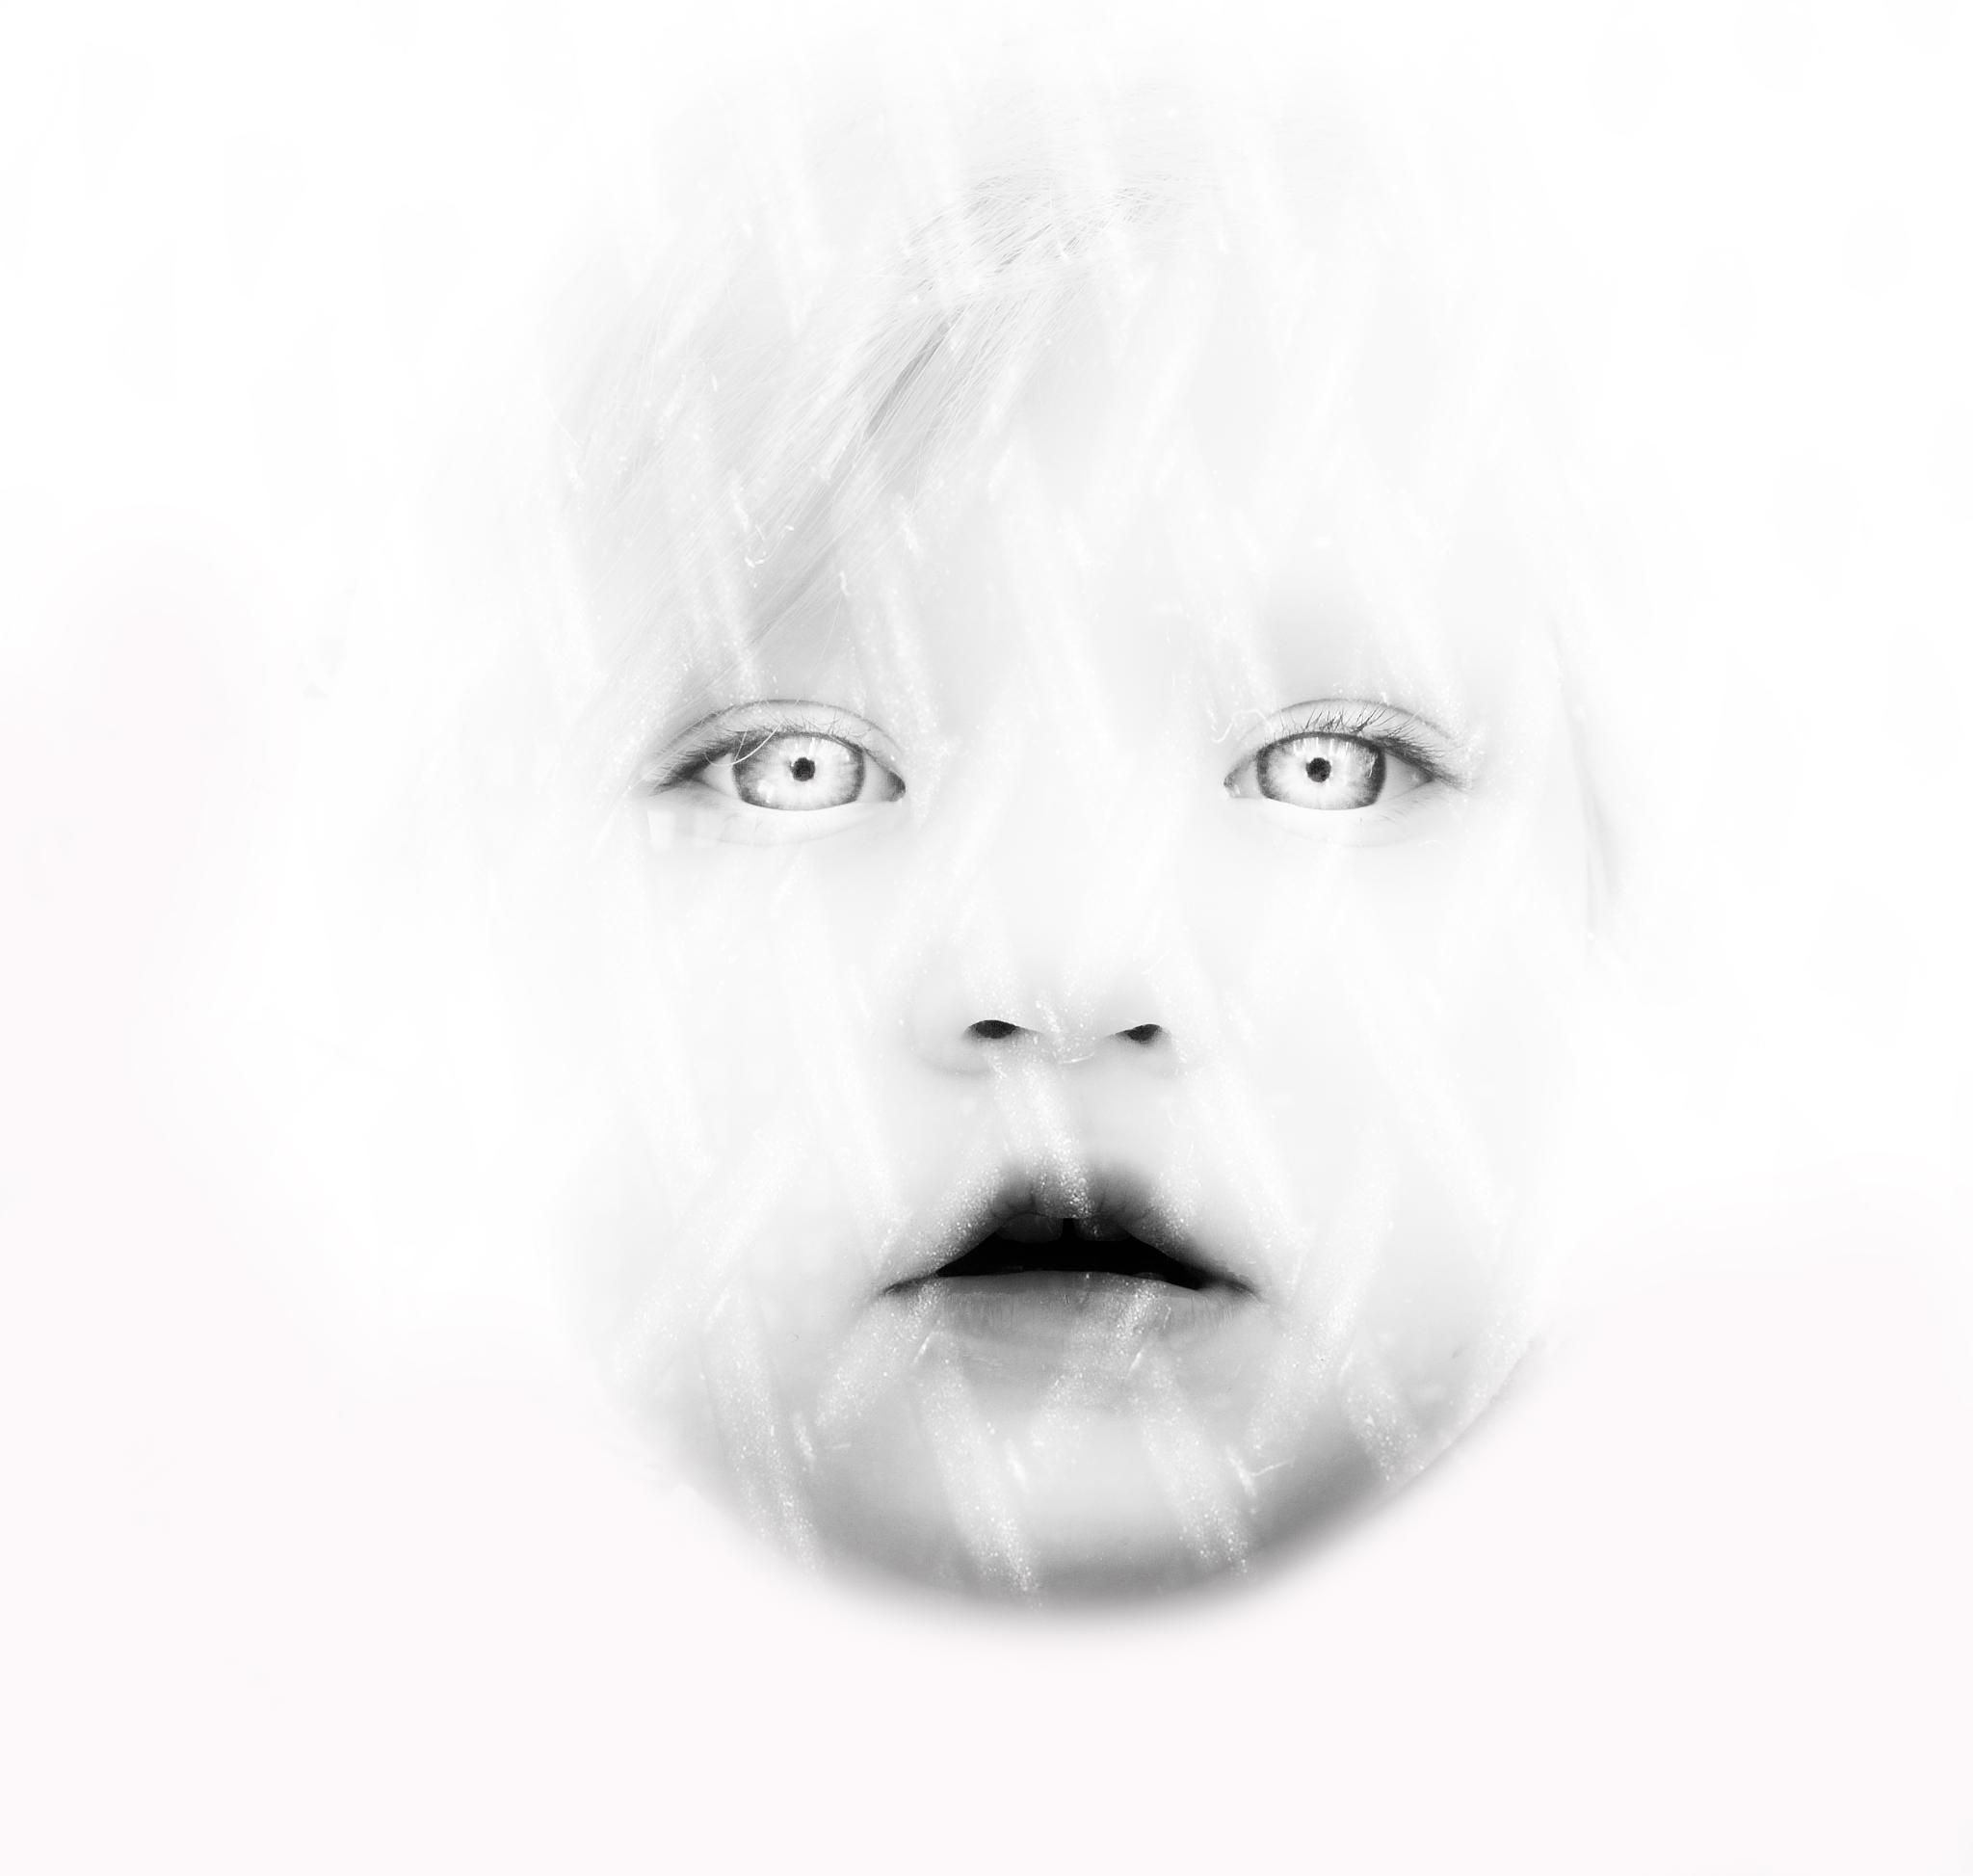 Child by david.pichler